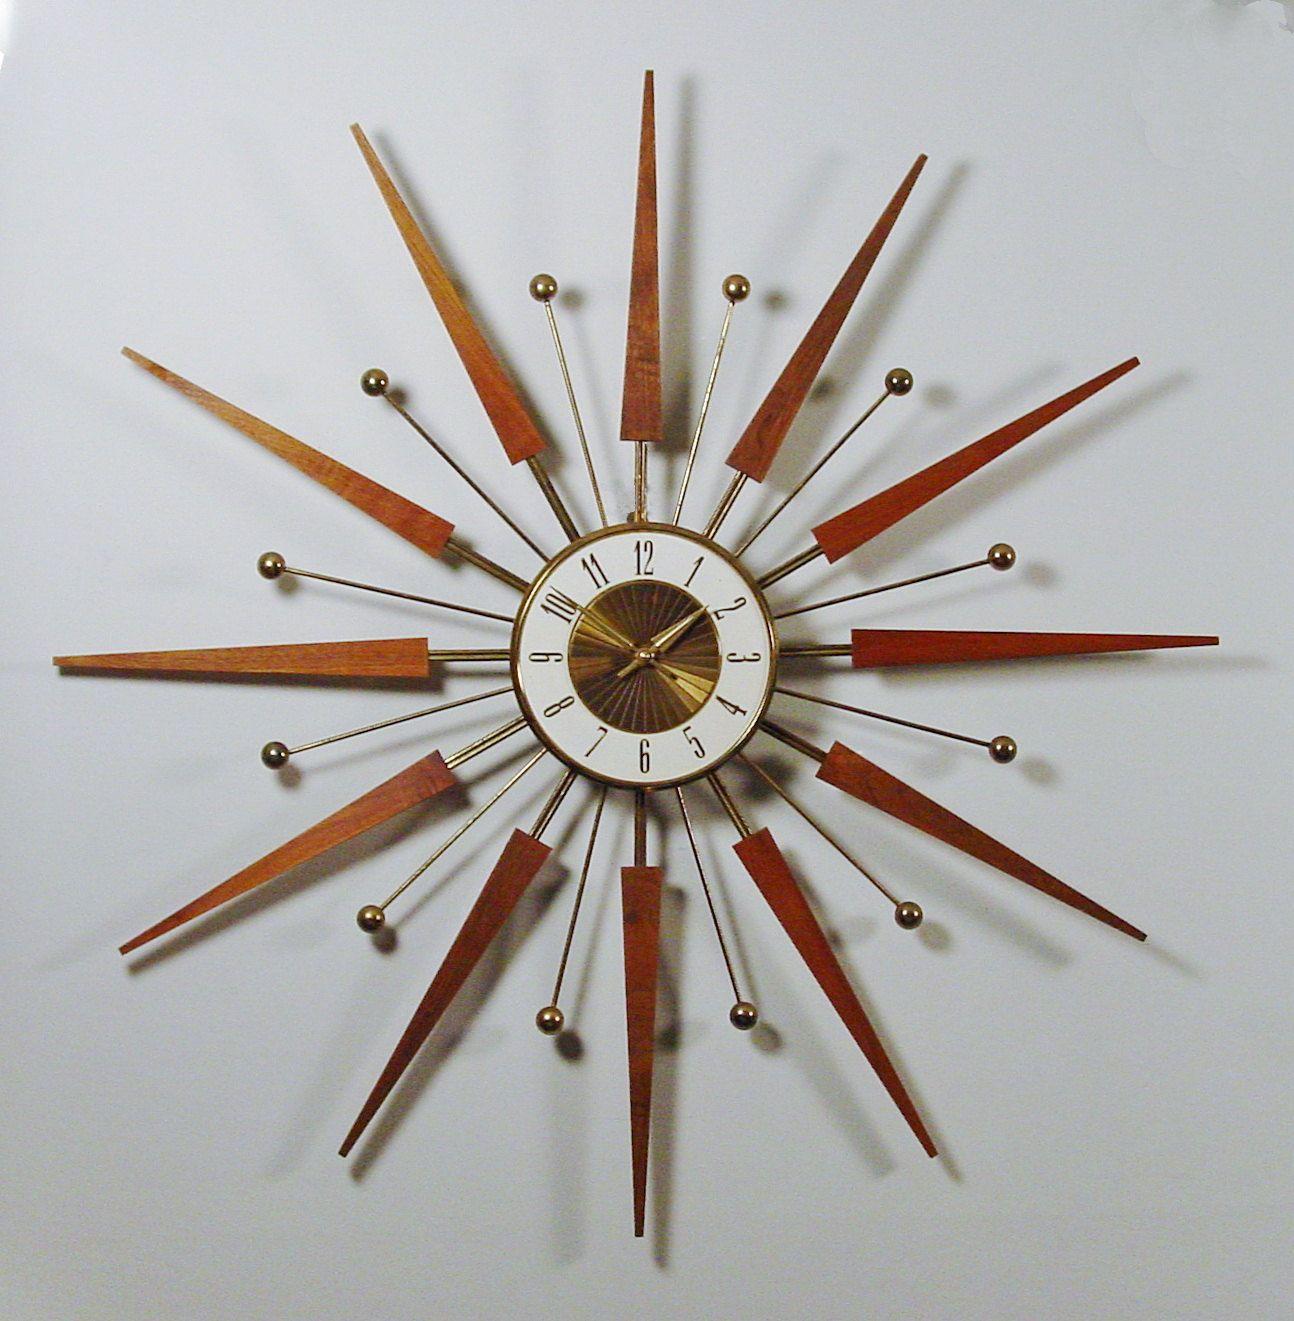 Mid Century Modern Starburst Wall Clock By Elgin Atomic Design 1960s Sci Fi Era Of Design Teak Rays Wall Clock Modern Mid Century Modern Wall Clock Mid Century Clock